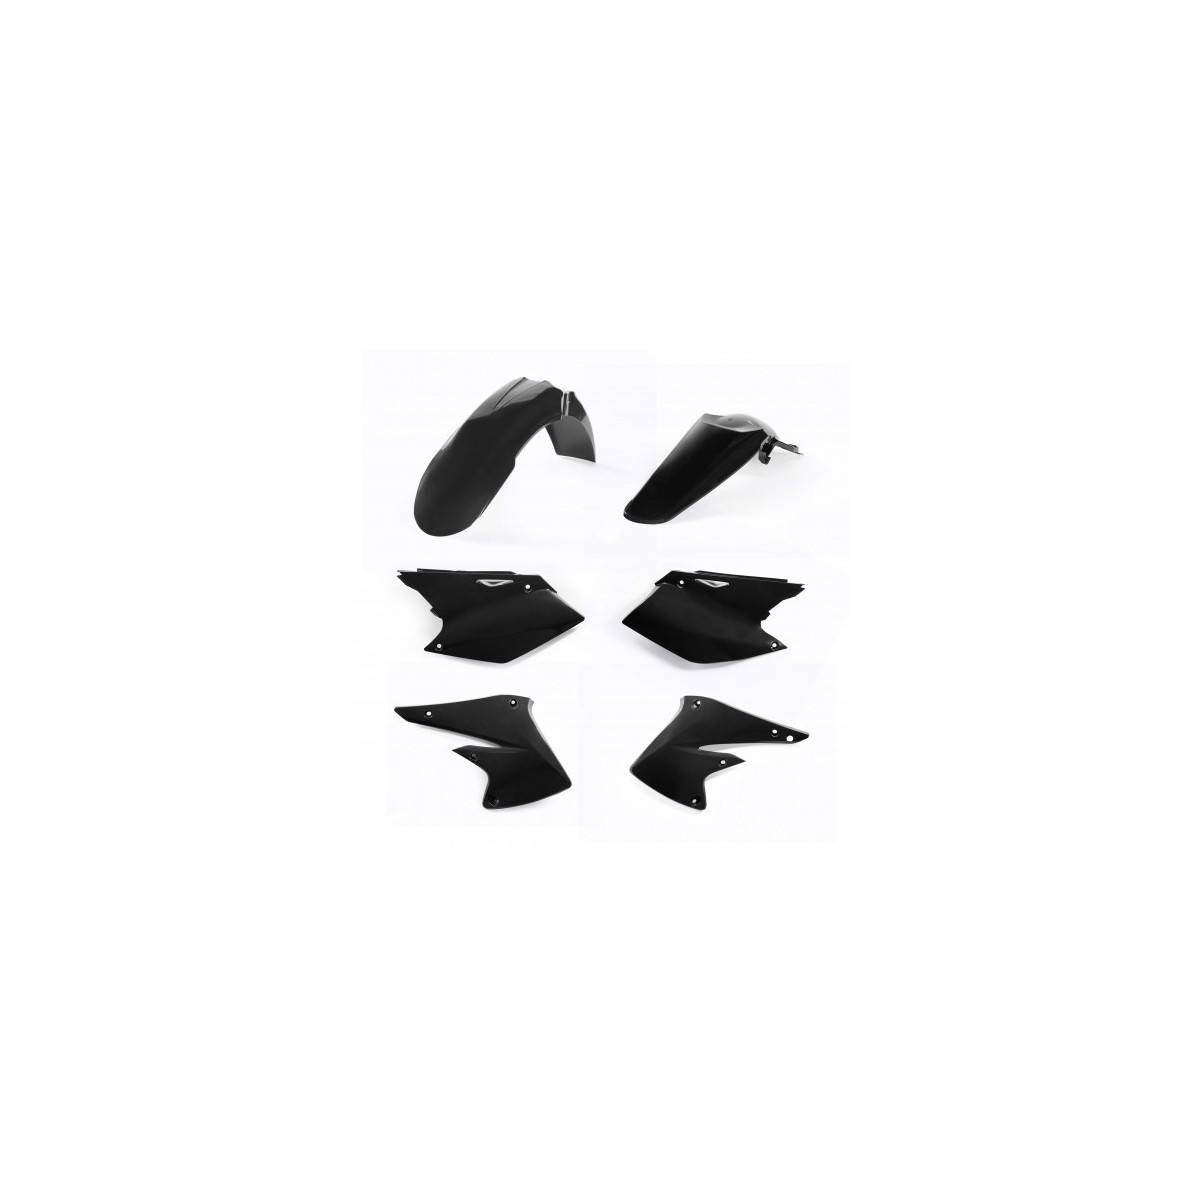 0007526-010 - Kit Plasticos Ktm 03 Negro